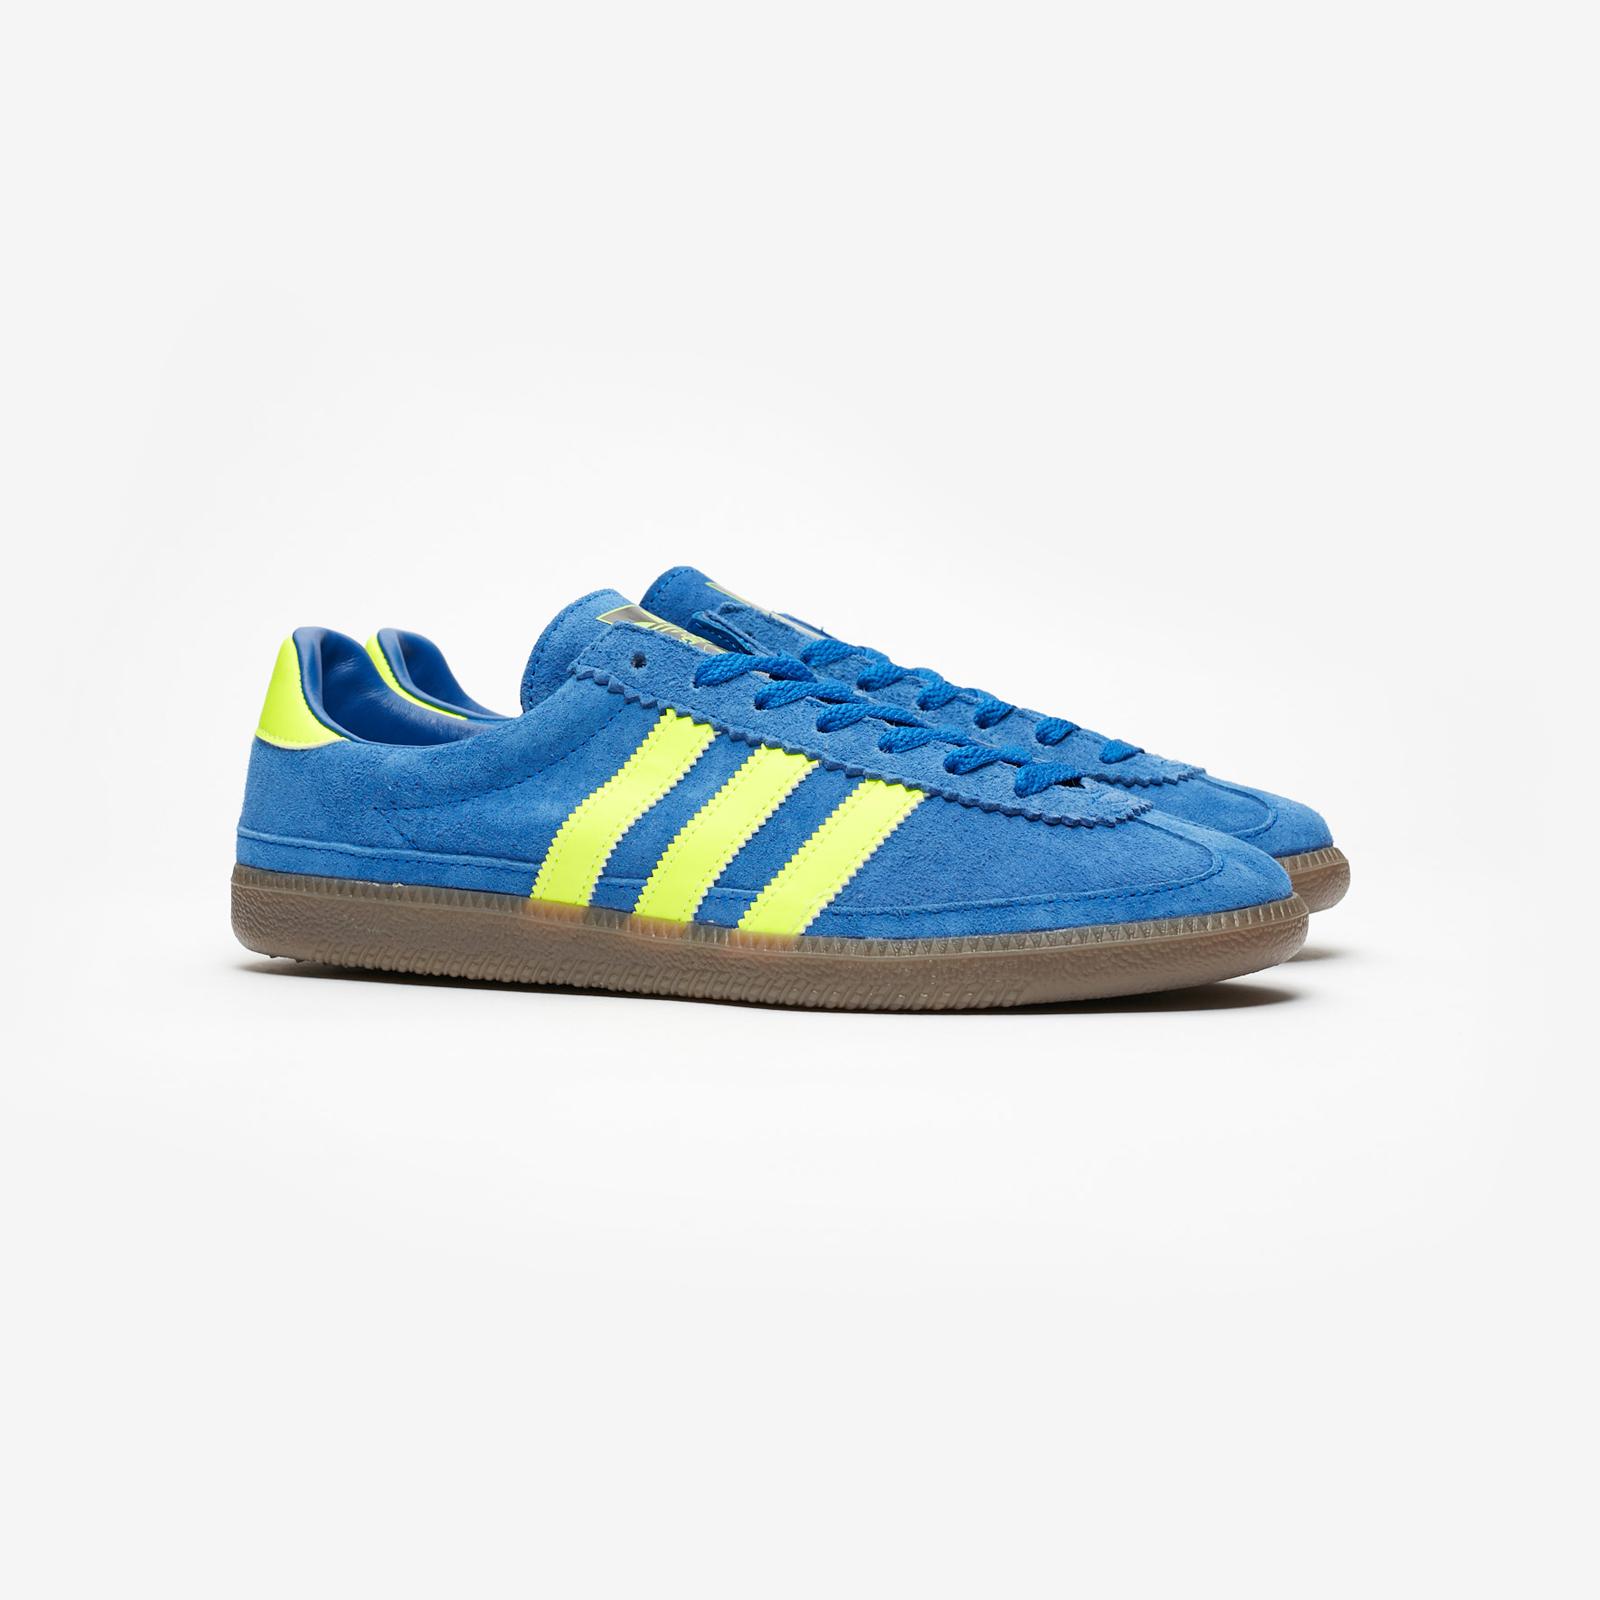 finest selection 710c2 07185 adidas Originals Spezial Whalley